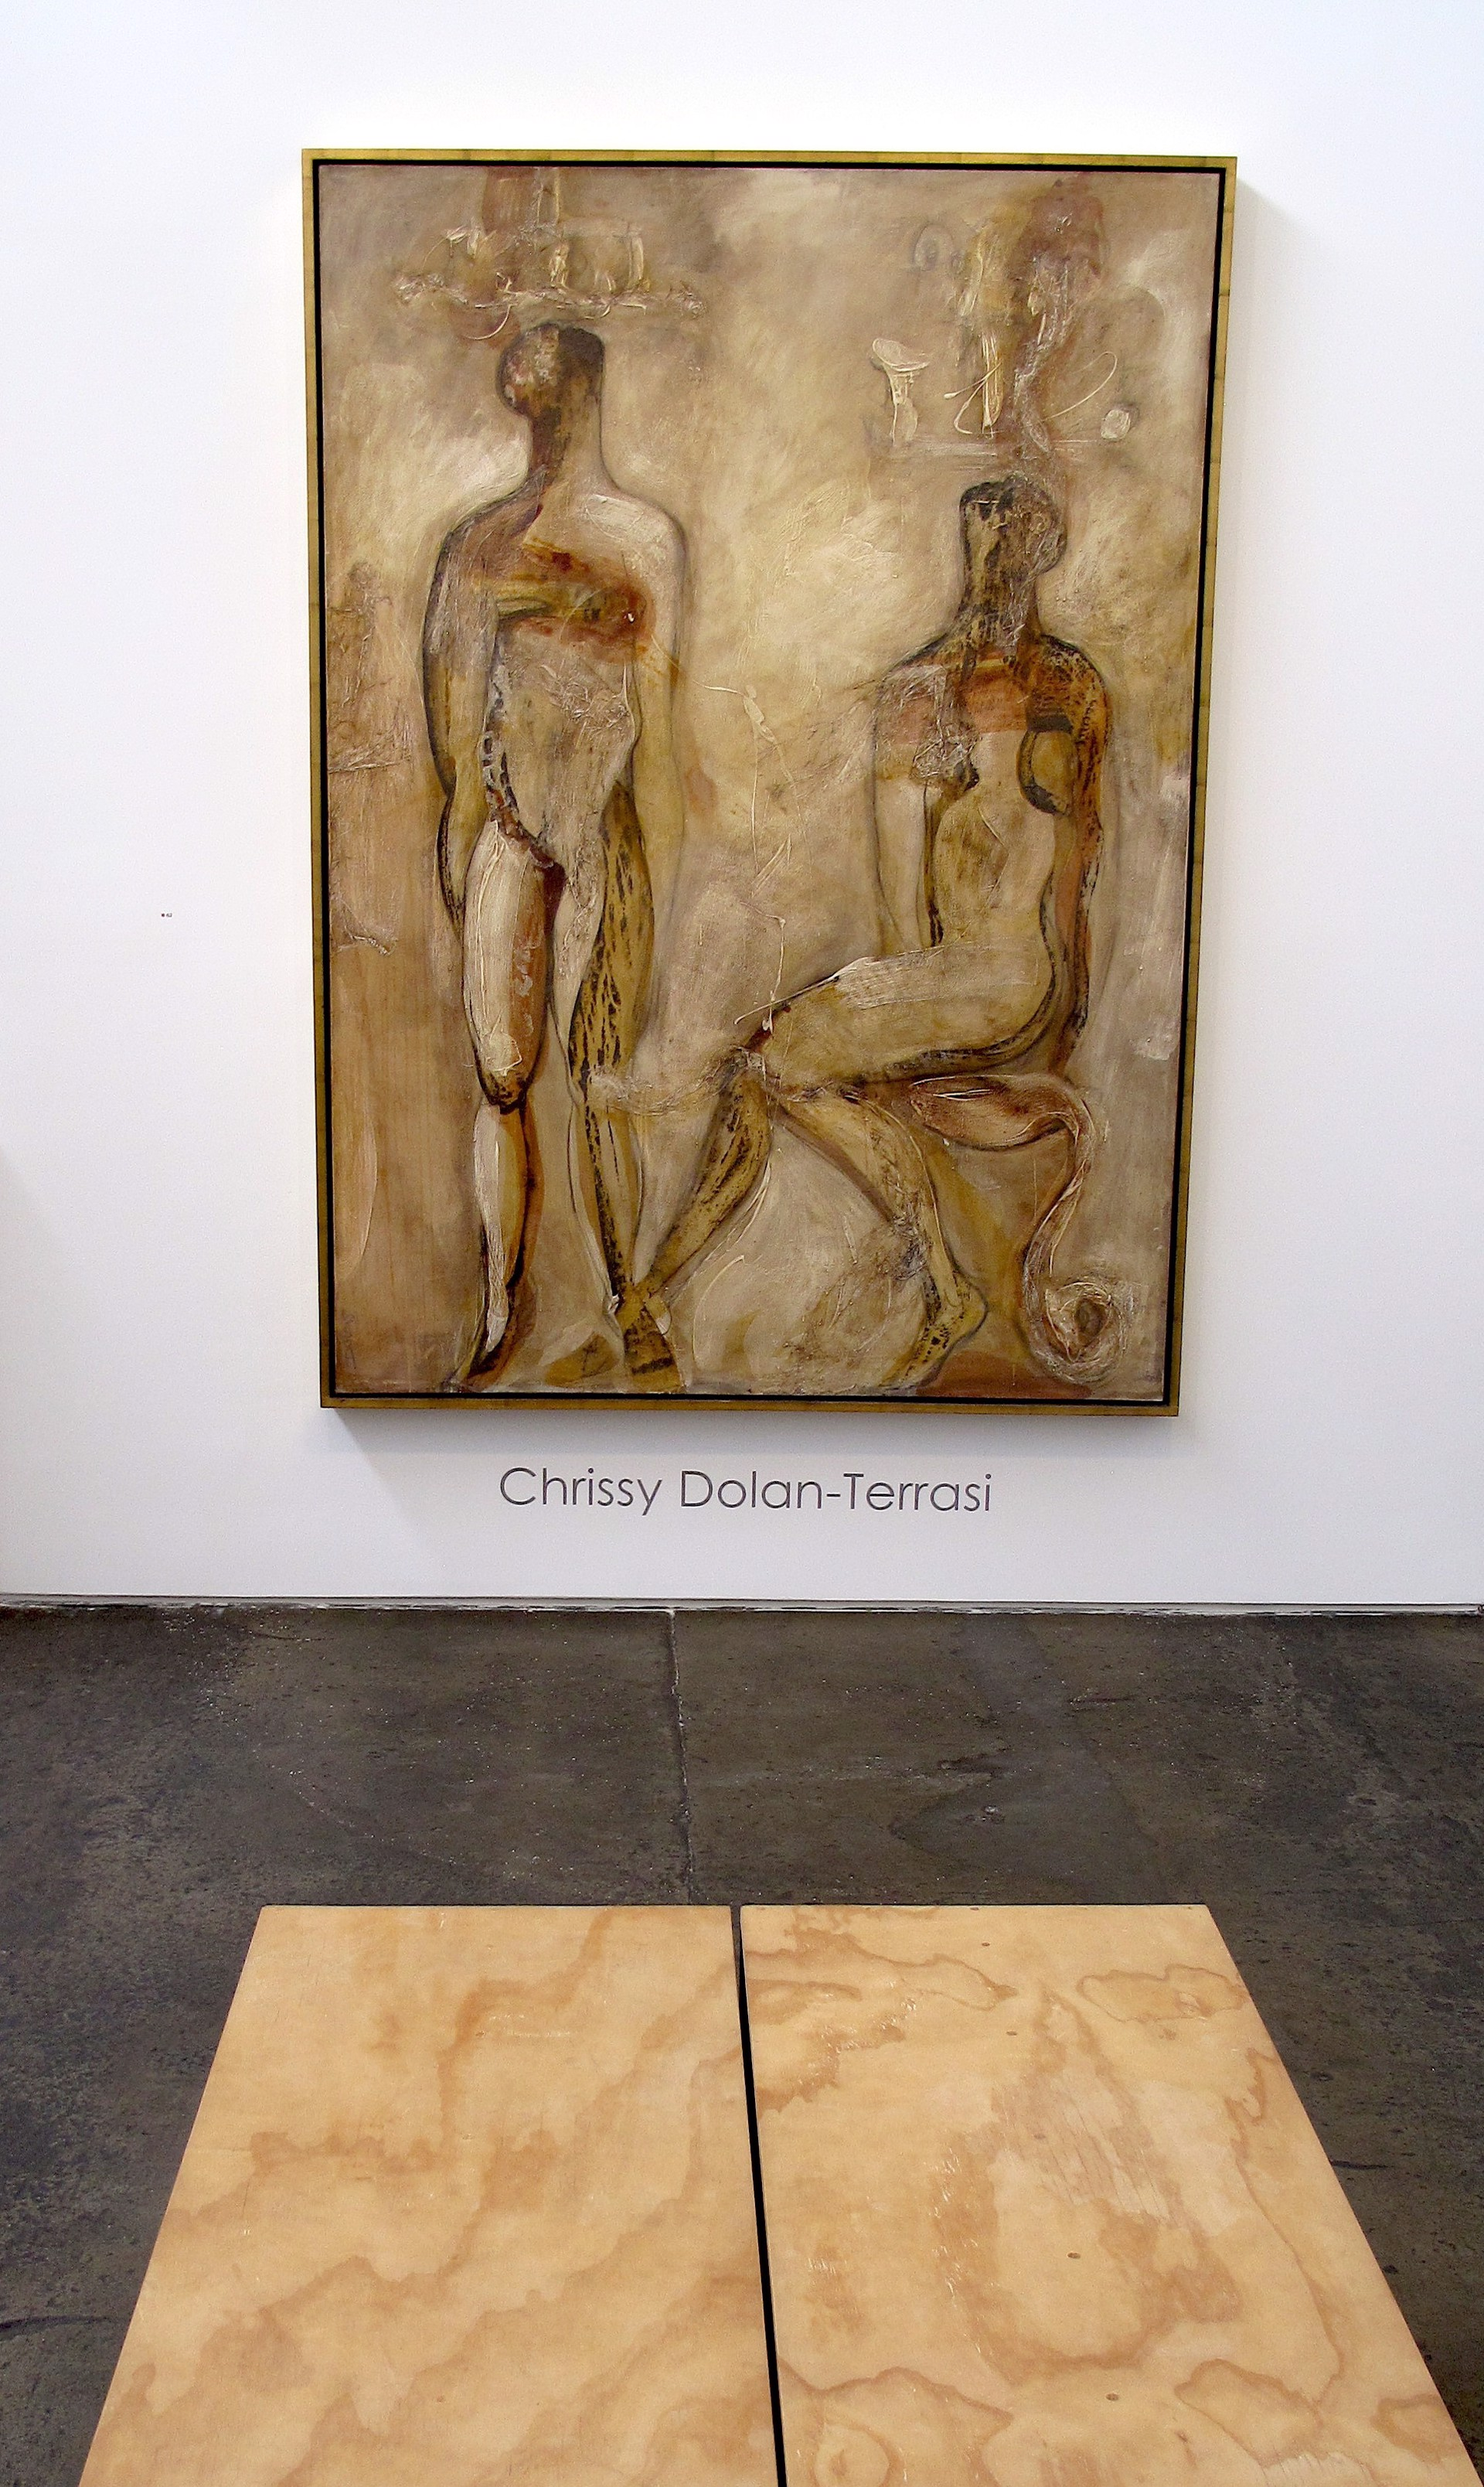 Candlebearers by Chrissy Dolan-Terrasi